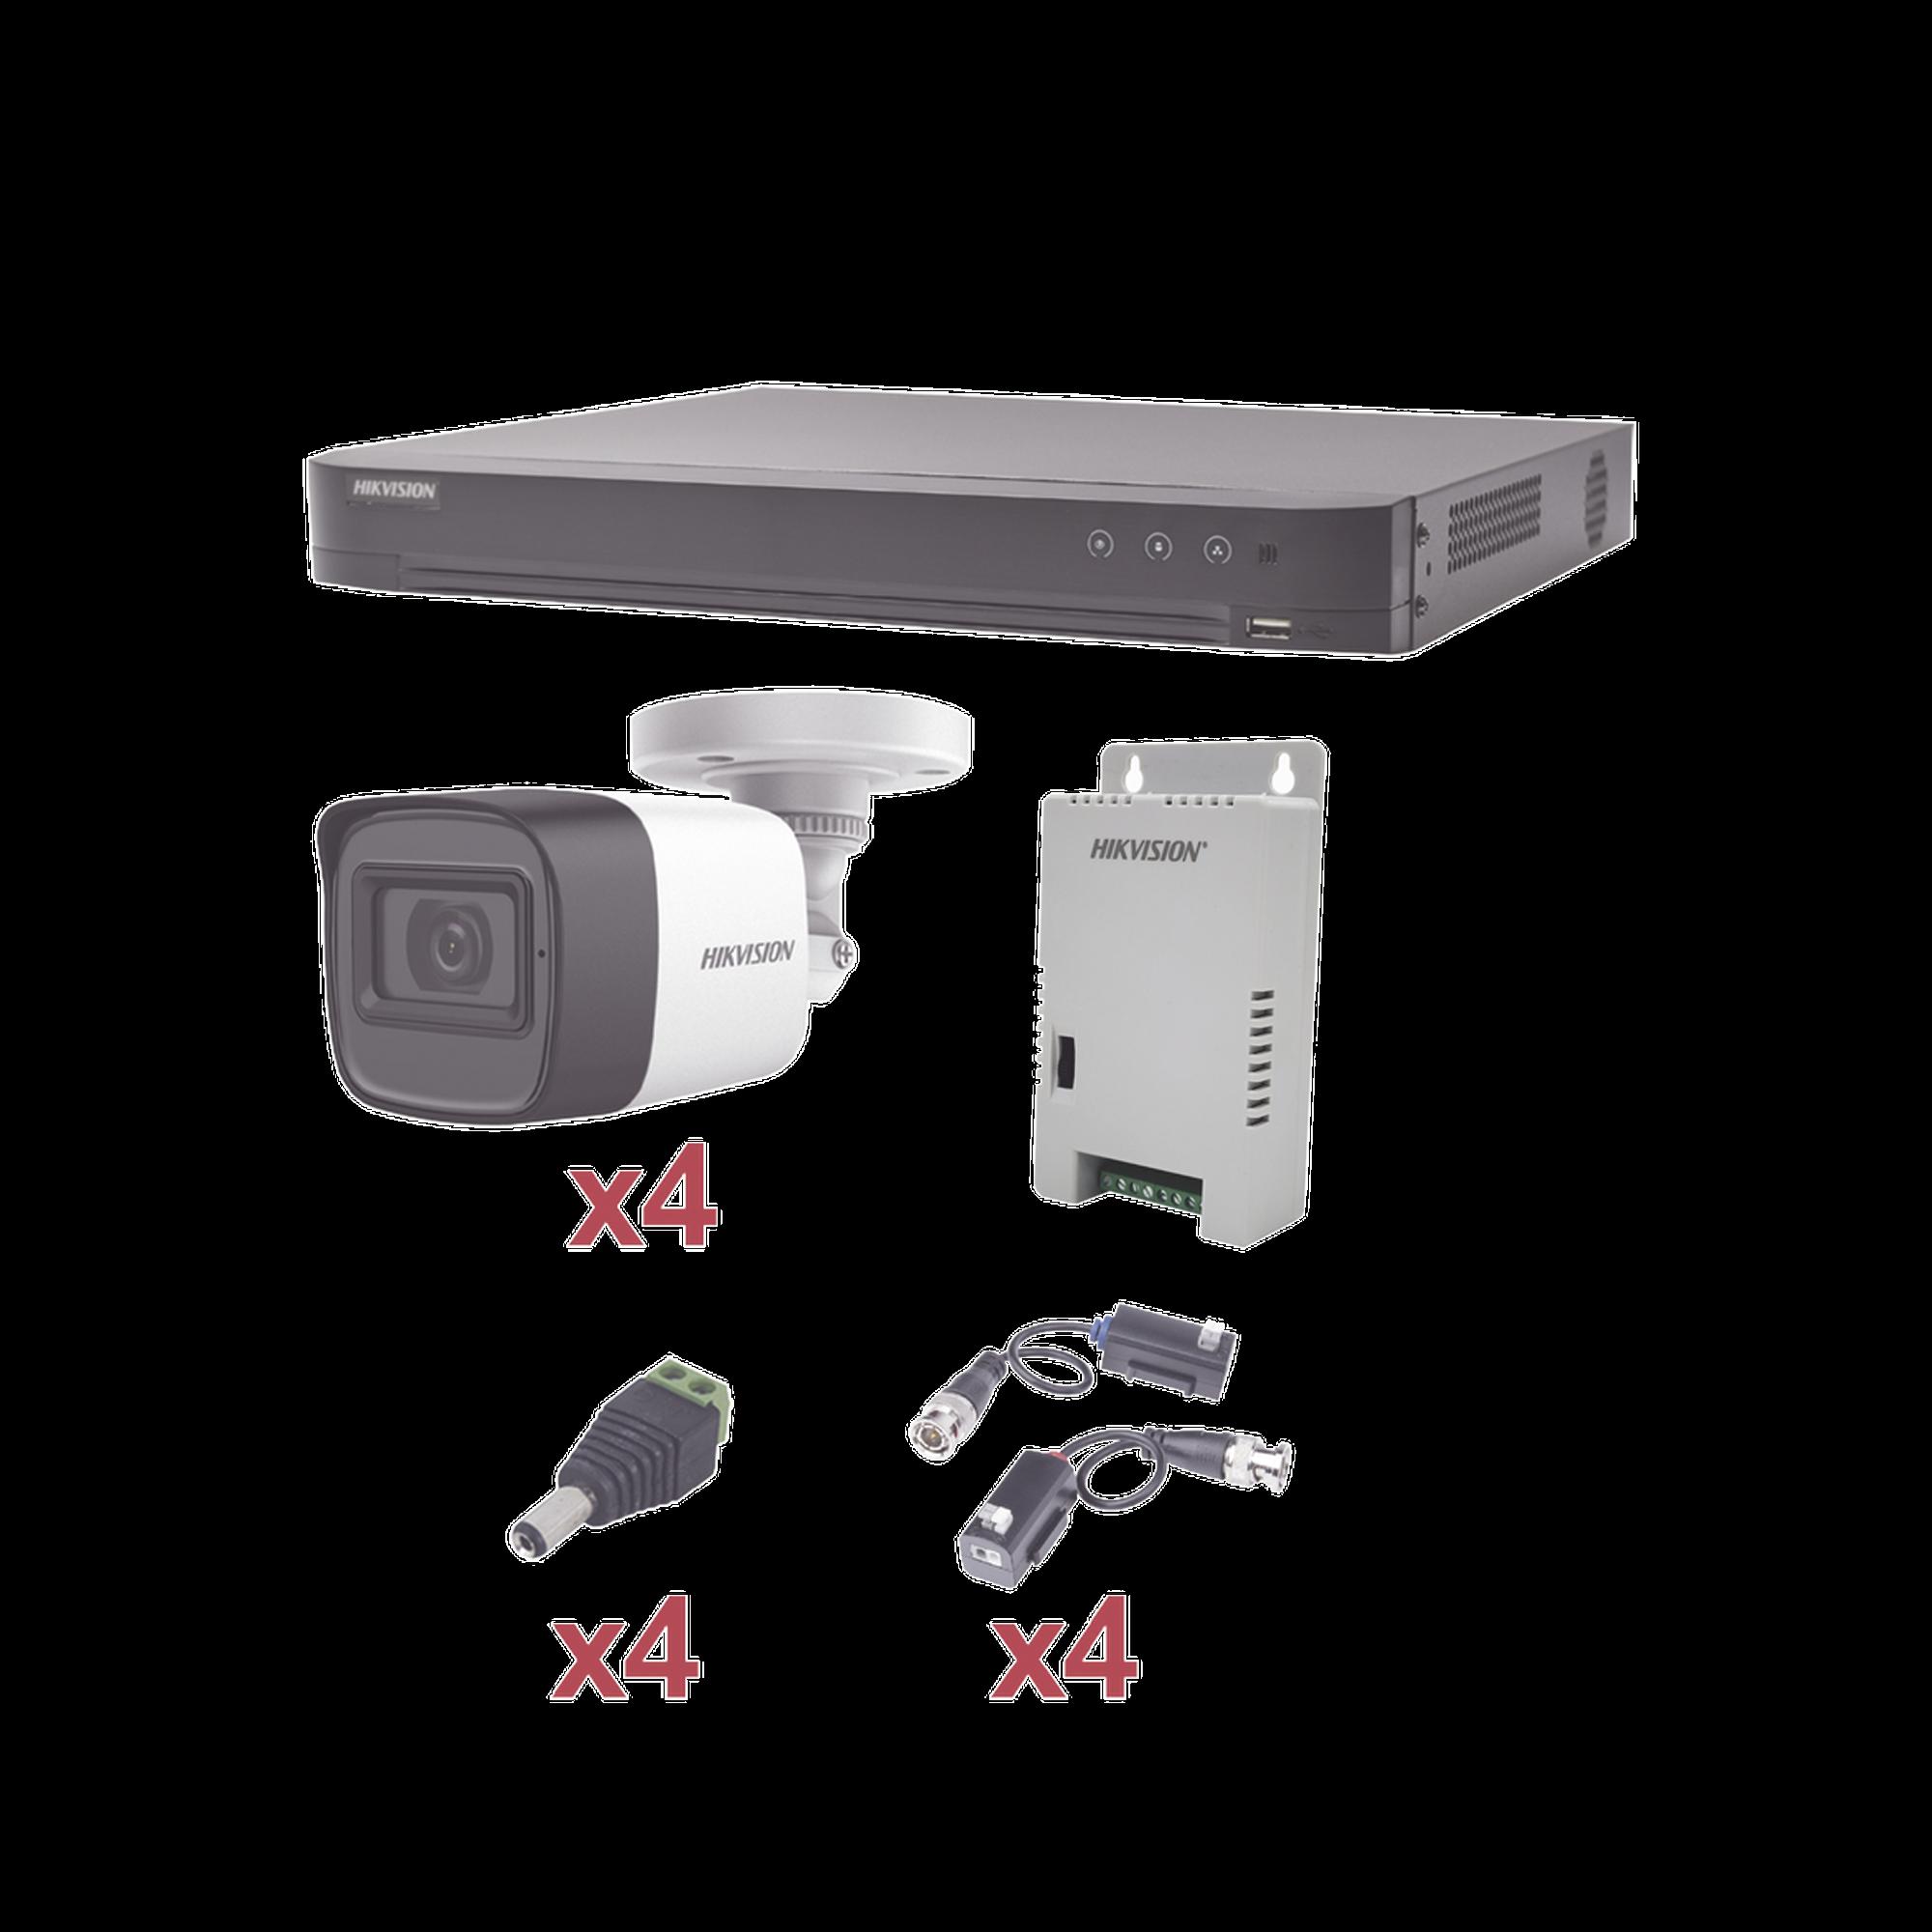 Sistema HIKVISION TURBOHD 1080p / DVR 4 Canales / 4 Cámaras Bala (exterior 2.8 mm) / Transceptores / Conectores / Fuente de Poder Profesional